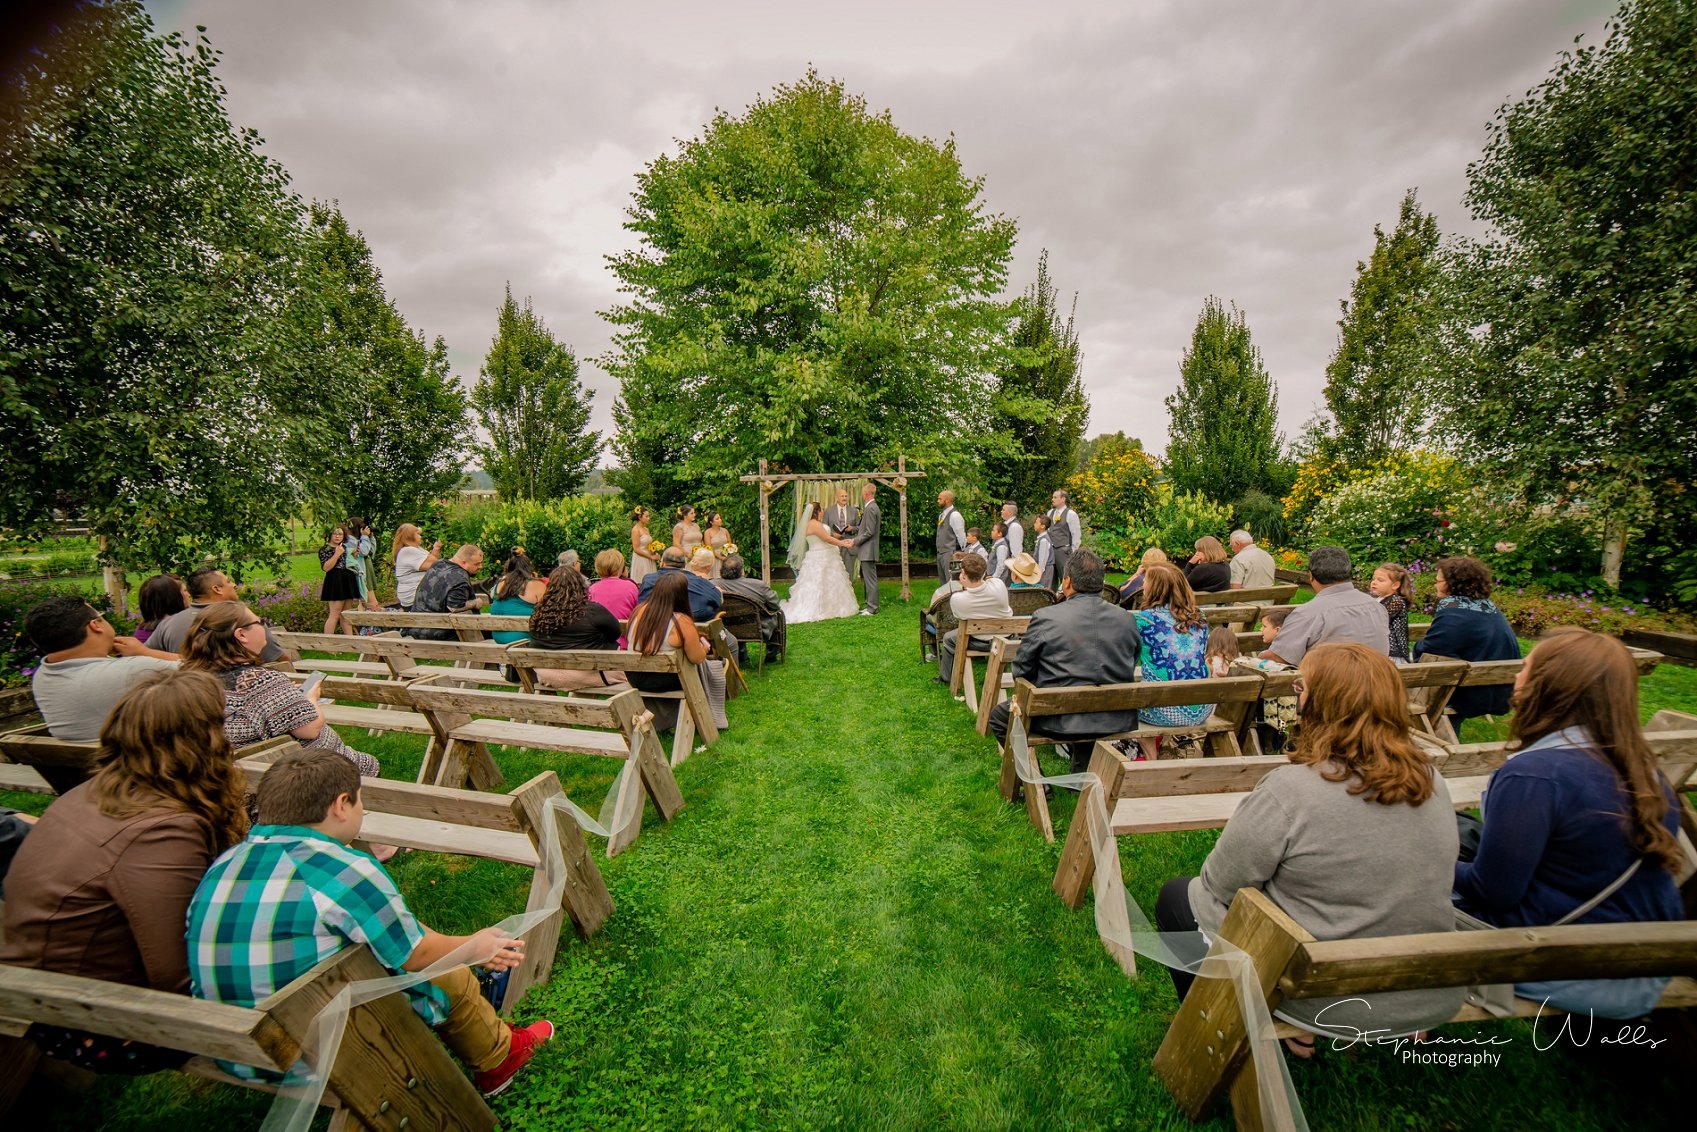 Kimble Wedding 186 1 Marlena & Allans | Snohomish Red Barn Events (Stocker Farms) | Snohomish, Wa Wedding Photographer